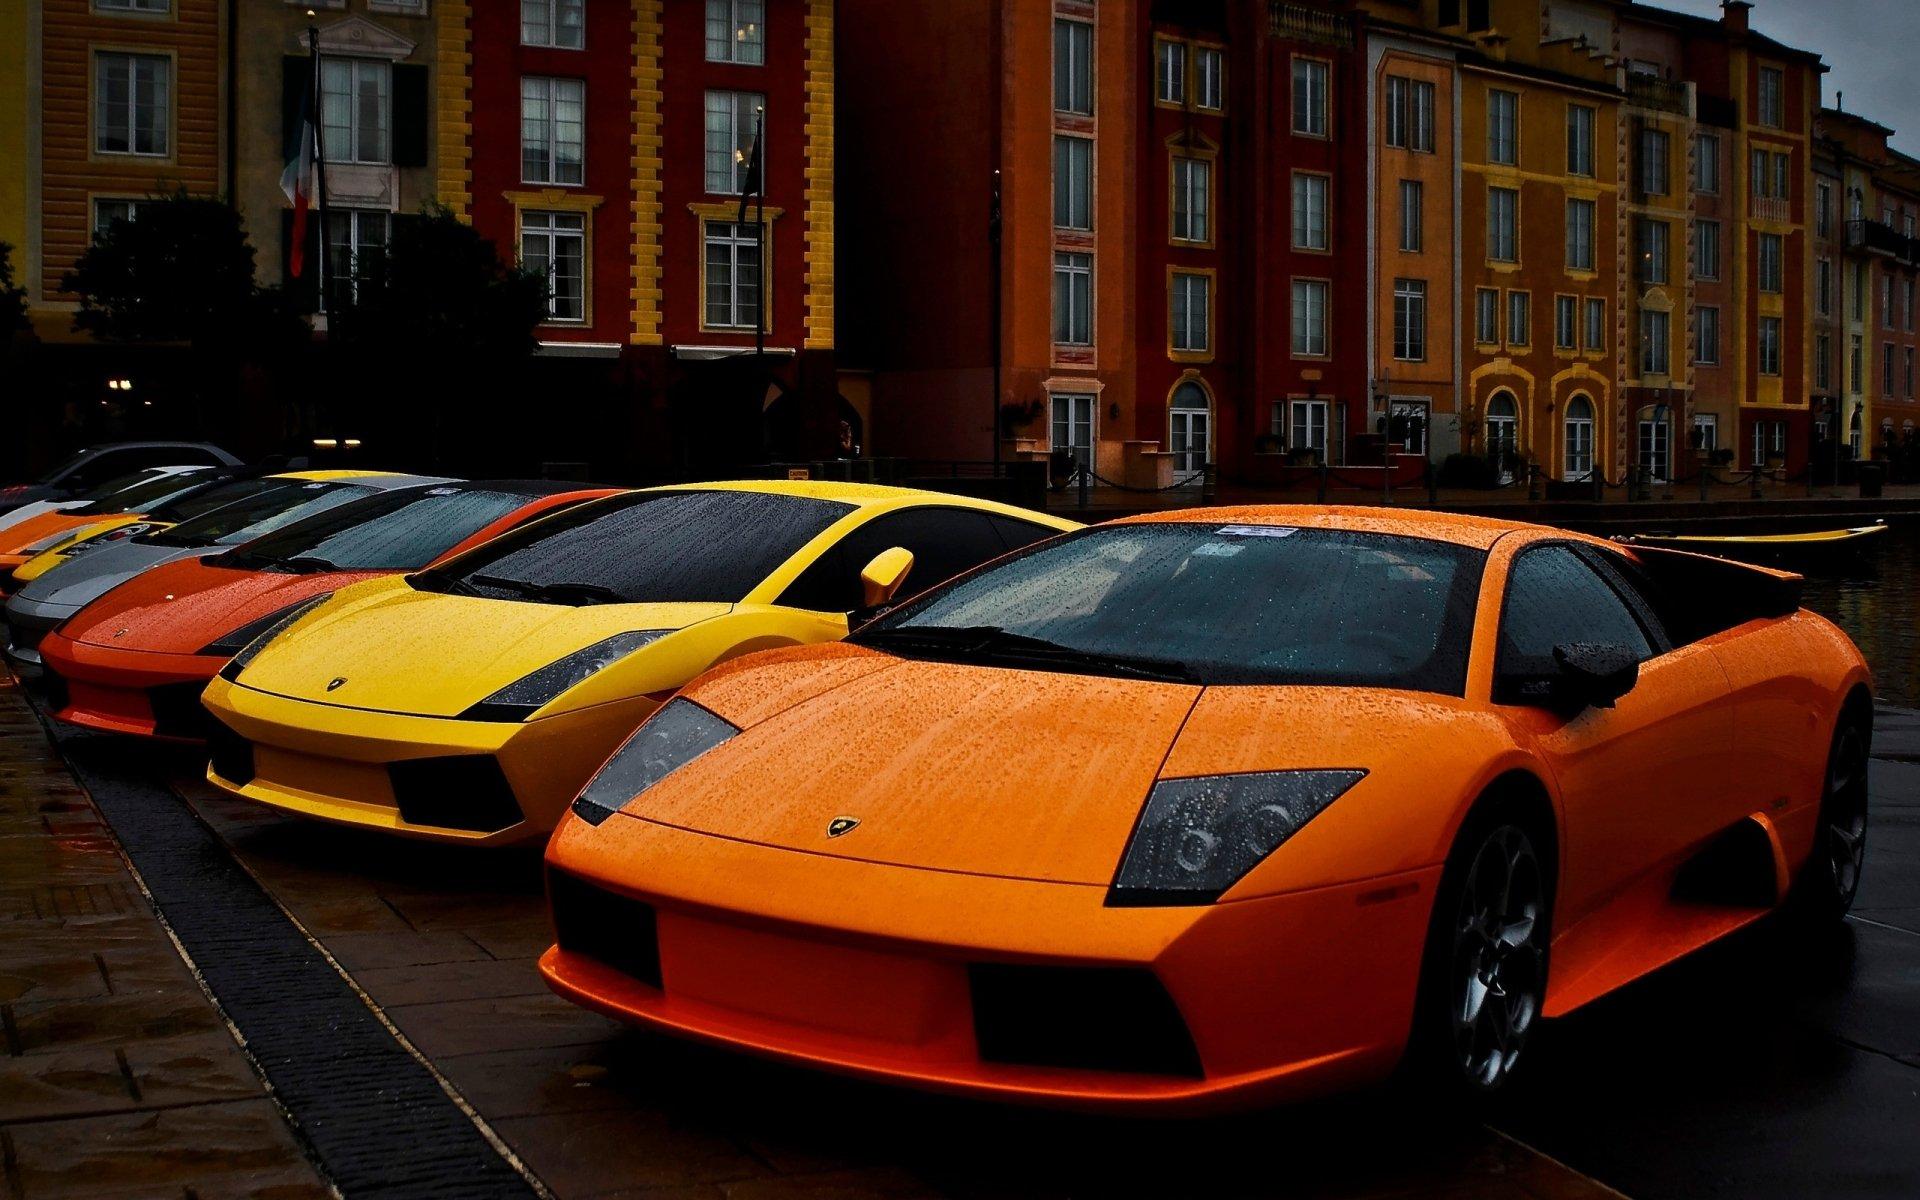 Vehicles - Lamborghini  Wallpaper